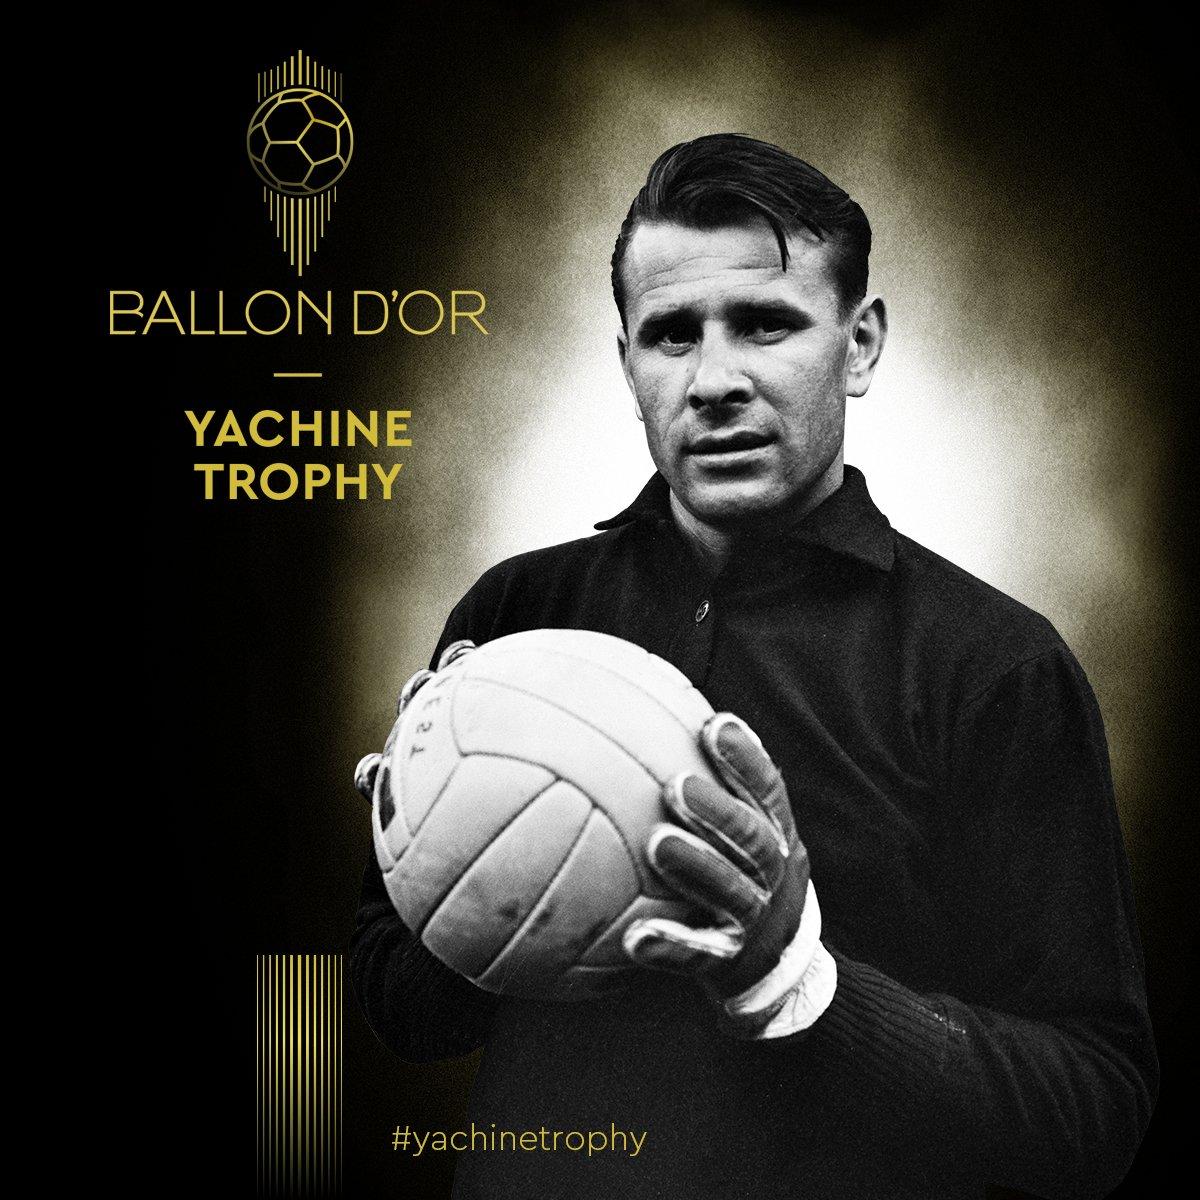 Trophée Yachine